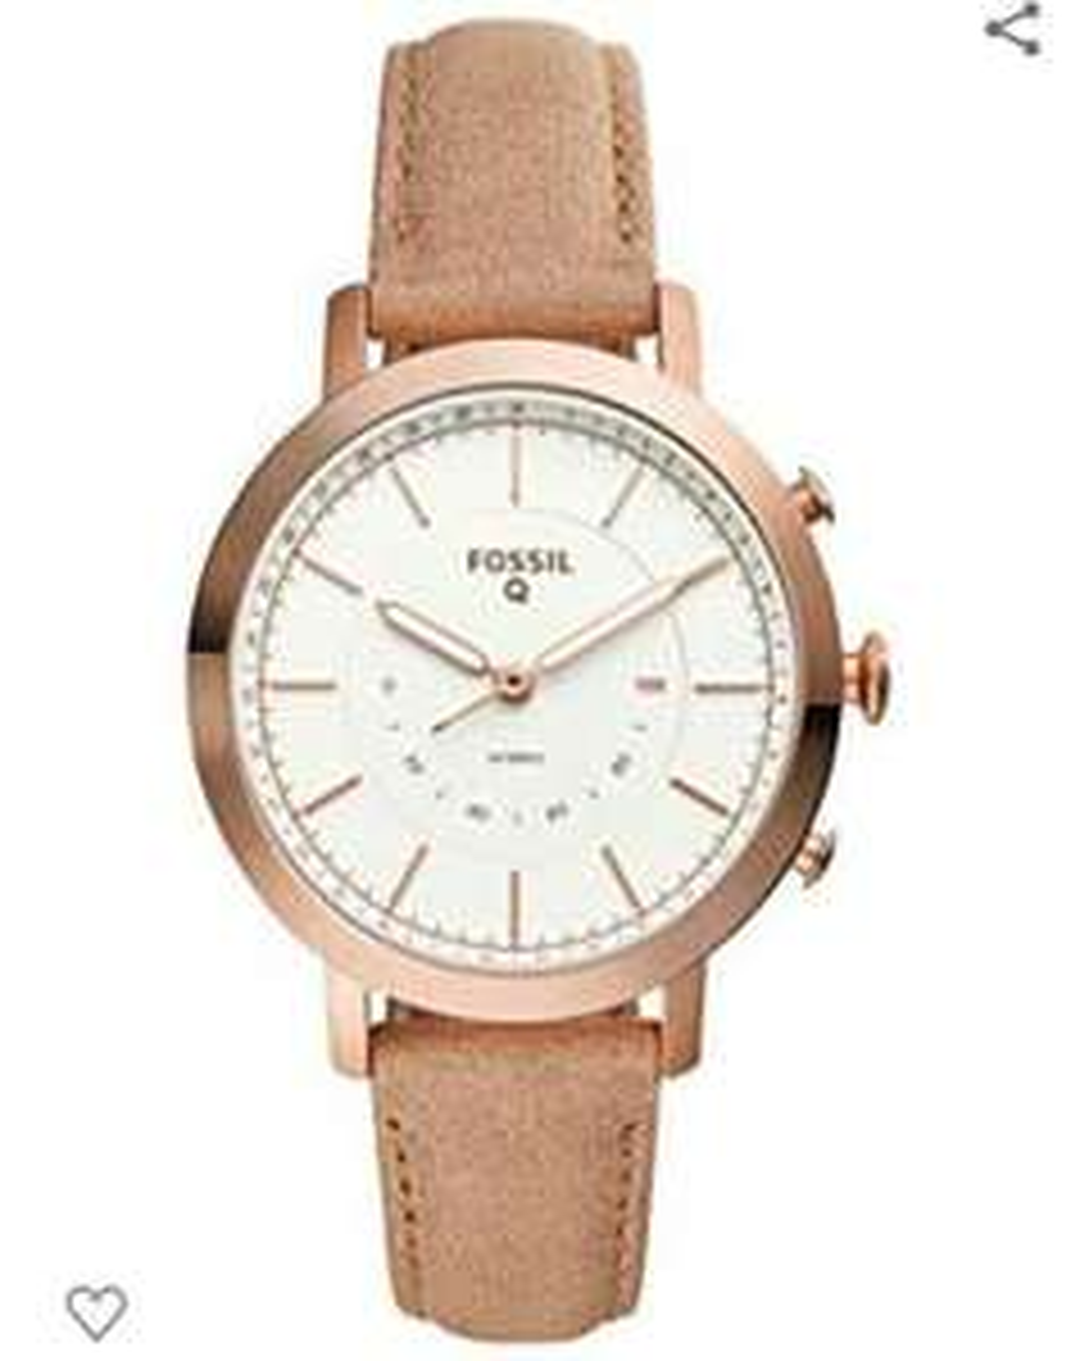 Amazon: Fossil Q Neely Reloj híbrido de mujer